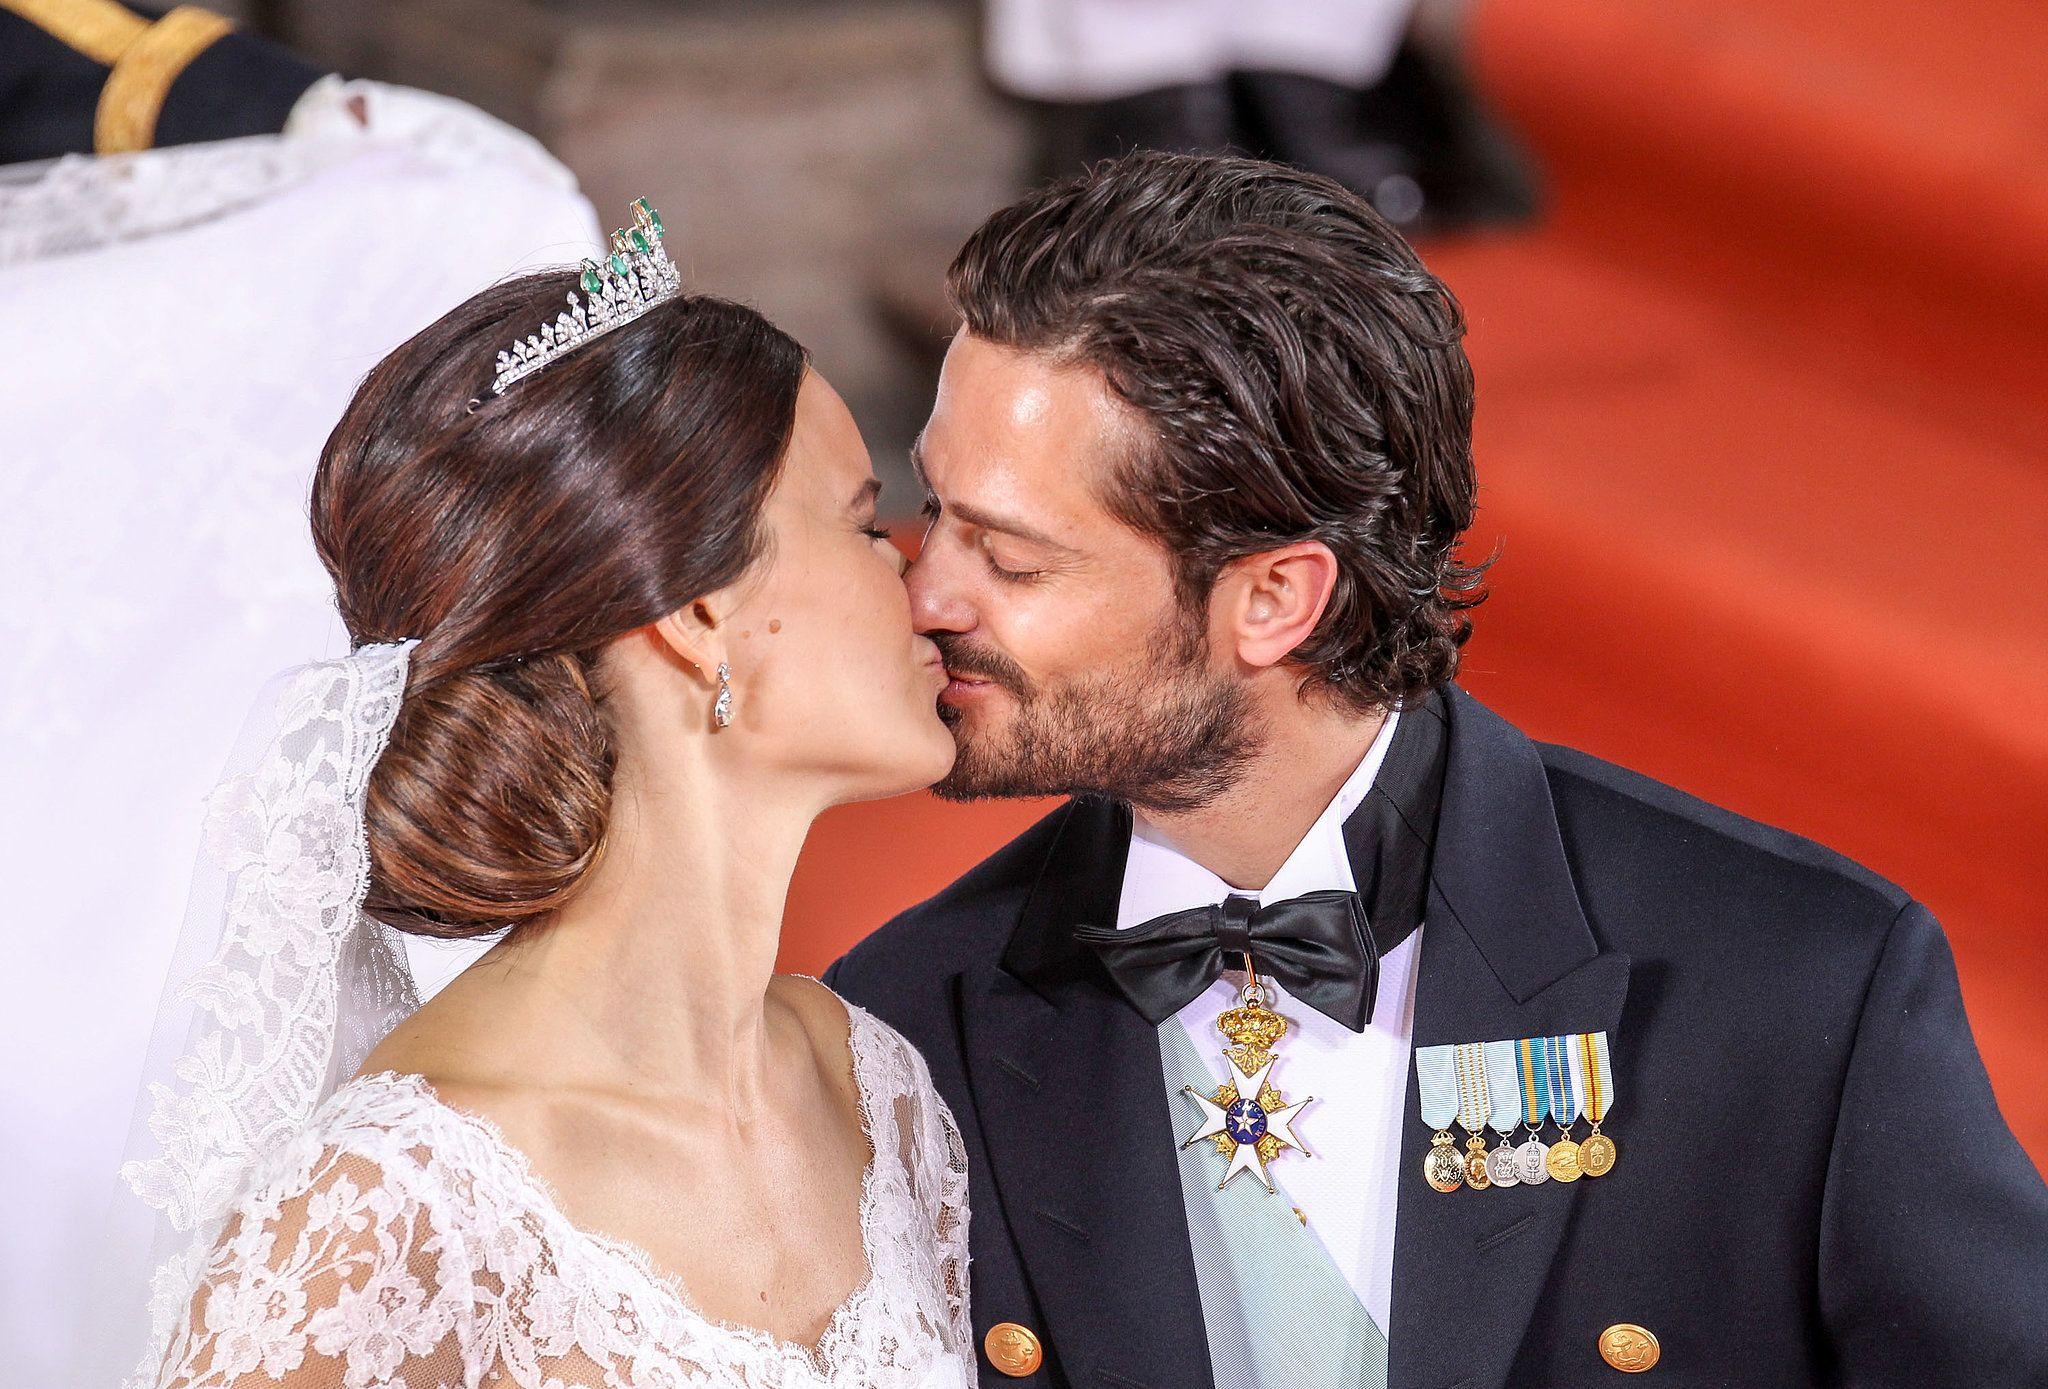 Prince Carl Philip Could Not Stop Kissing Princess Sofia at Their Romantic Wedding   Princess sofia of sweden, Prince carl philip, Princess sofia